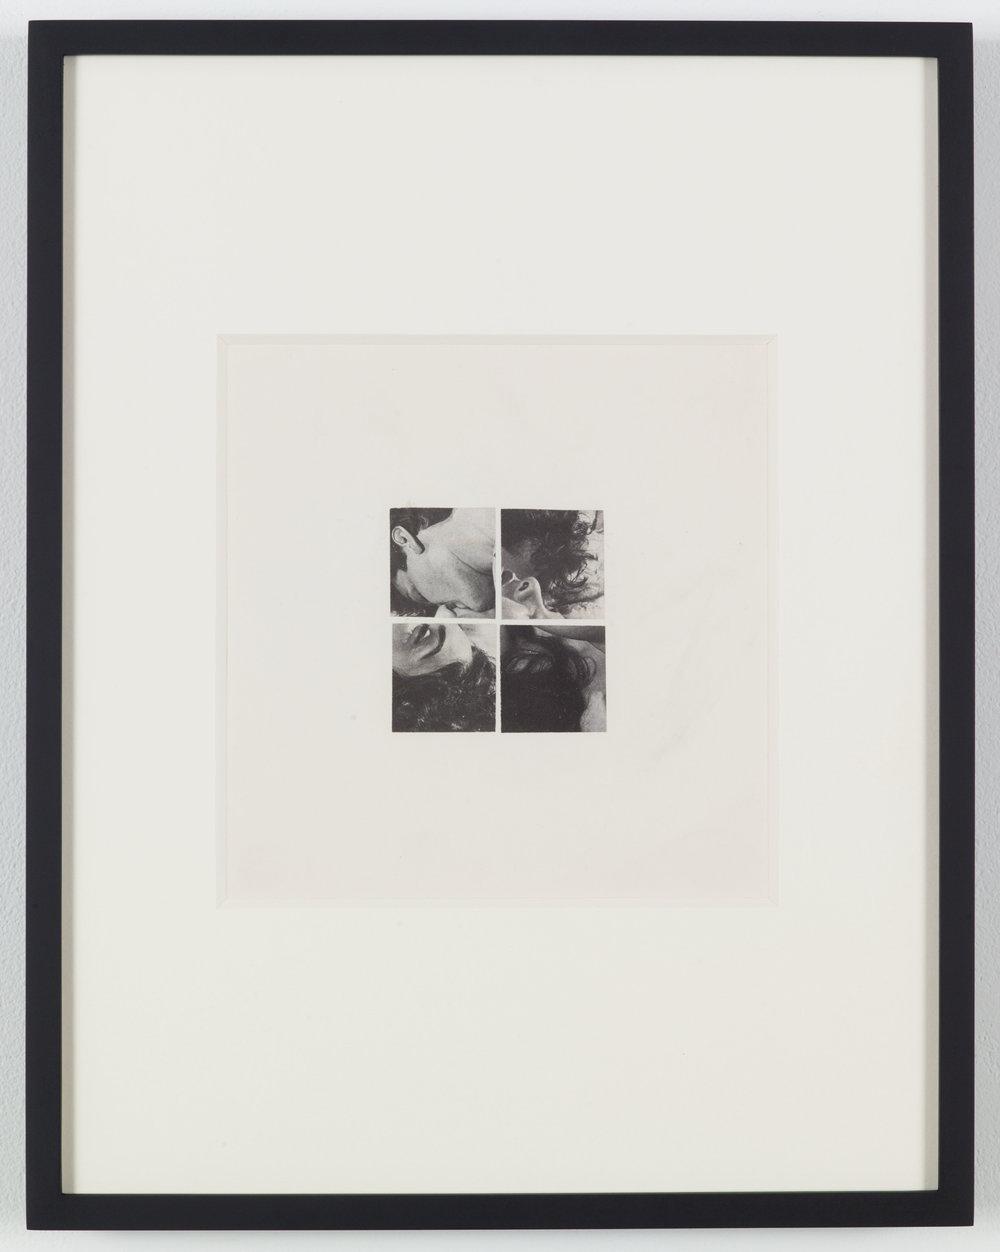 The word made flesh lll (Photoroman), 1977-78, Collage © John Stezaker & Petzel Gallery